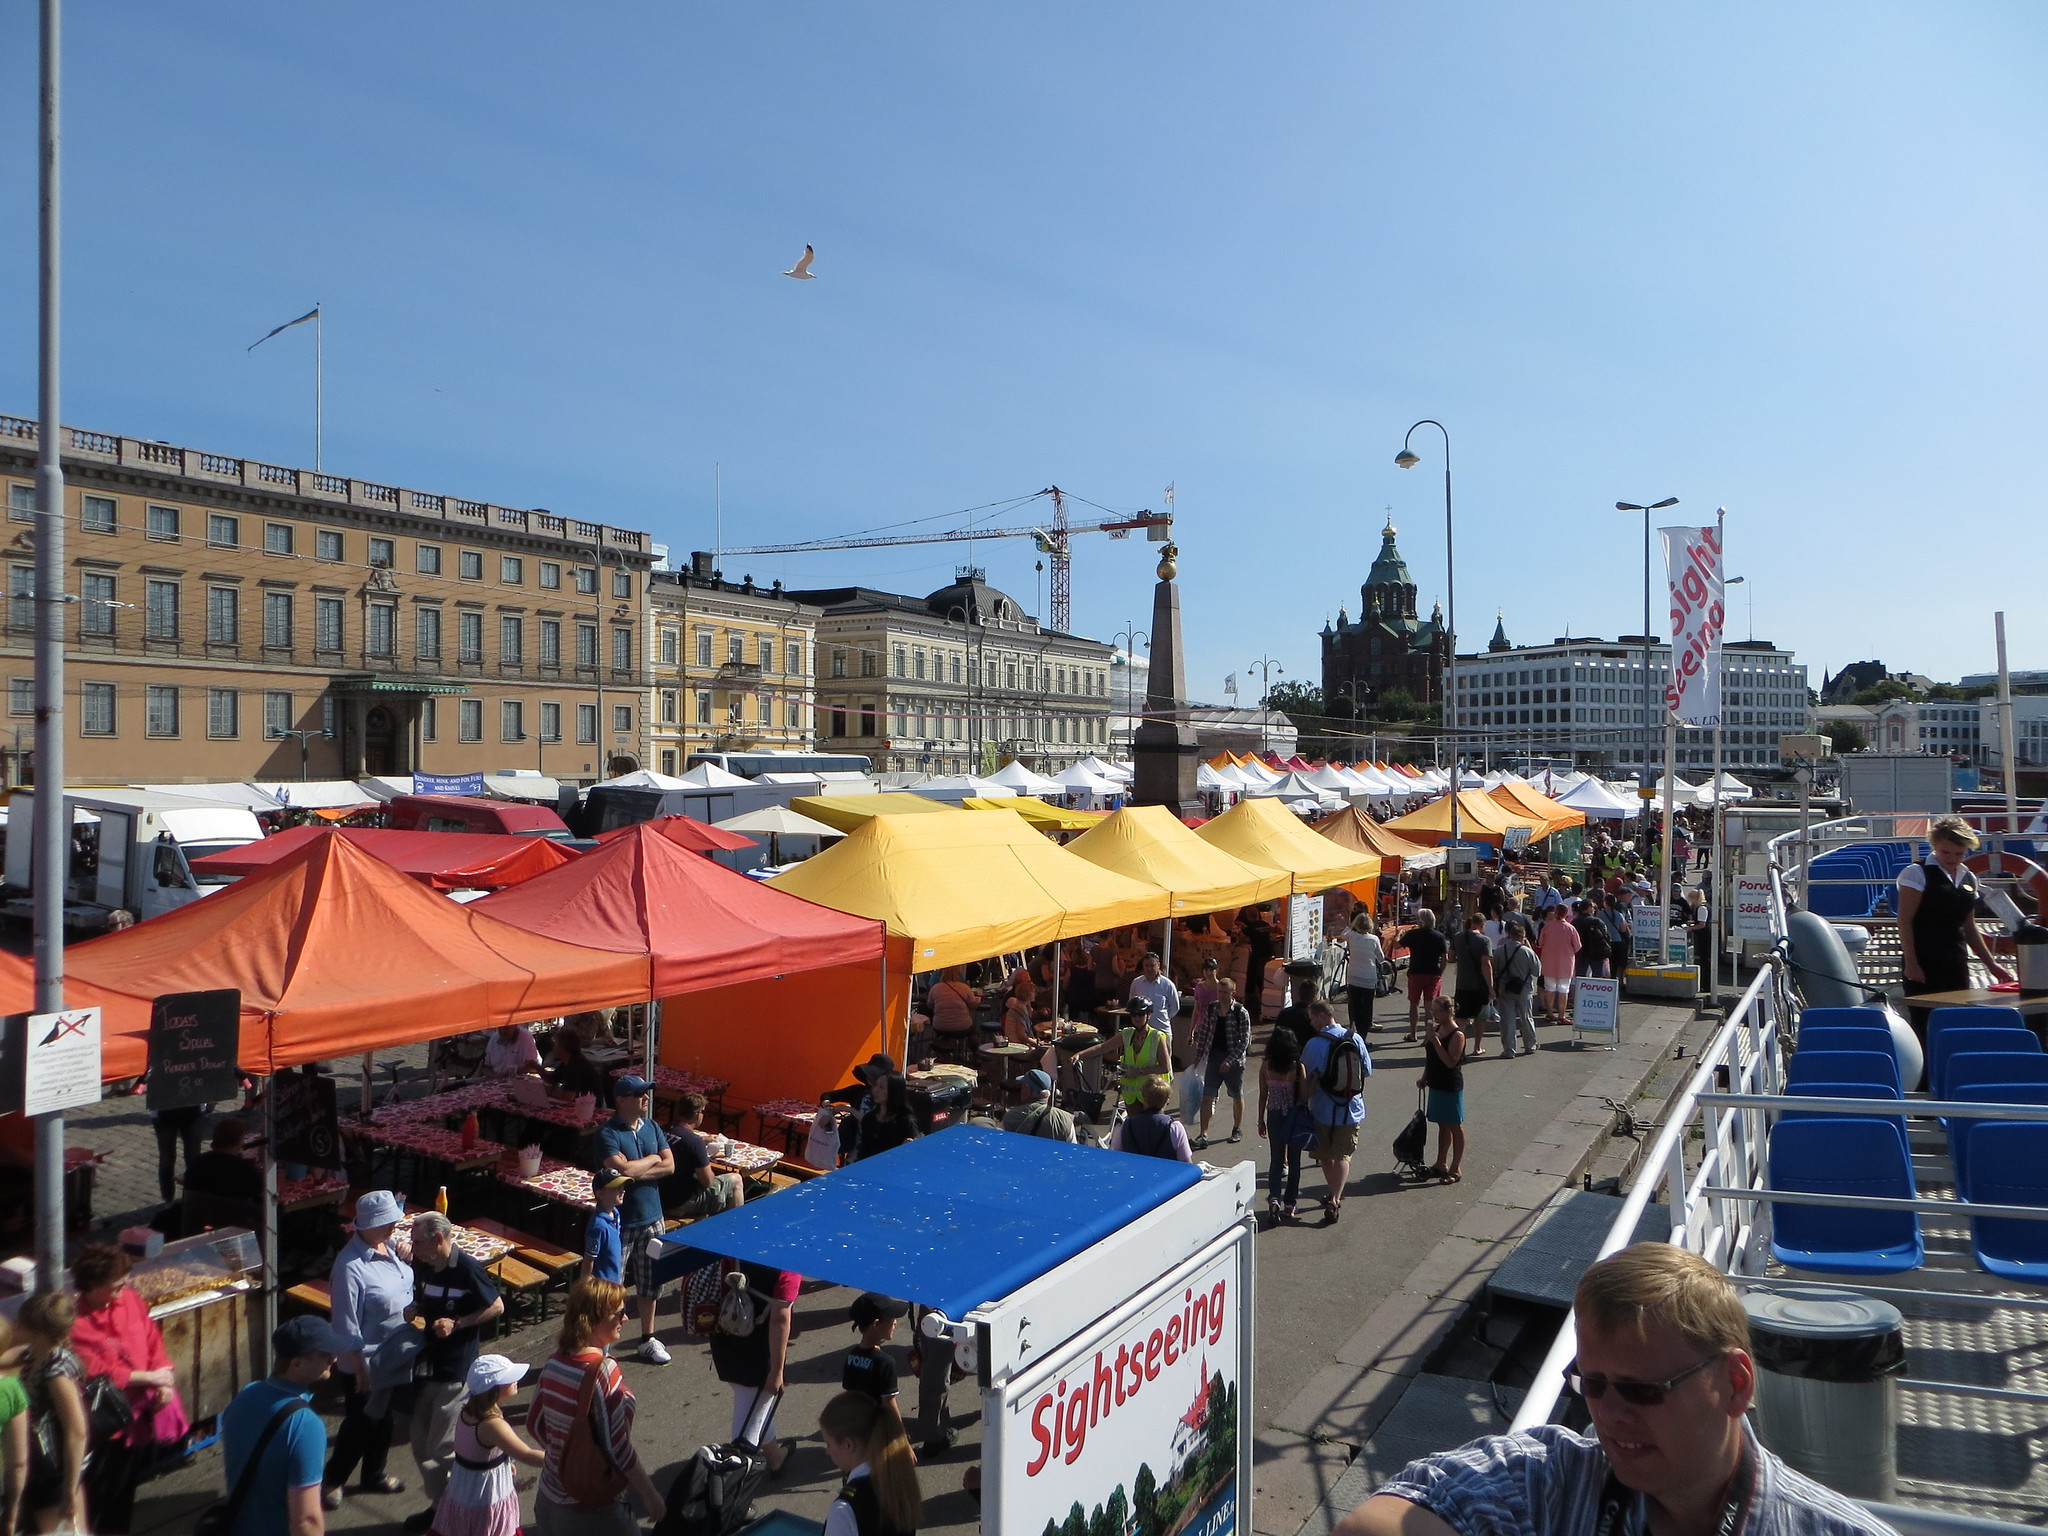 Market Square, Kauppatori, Helsinki Travel